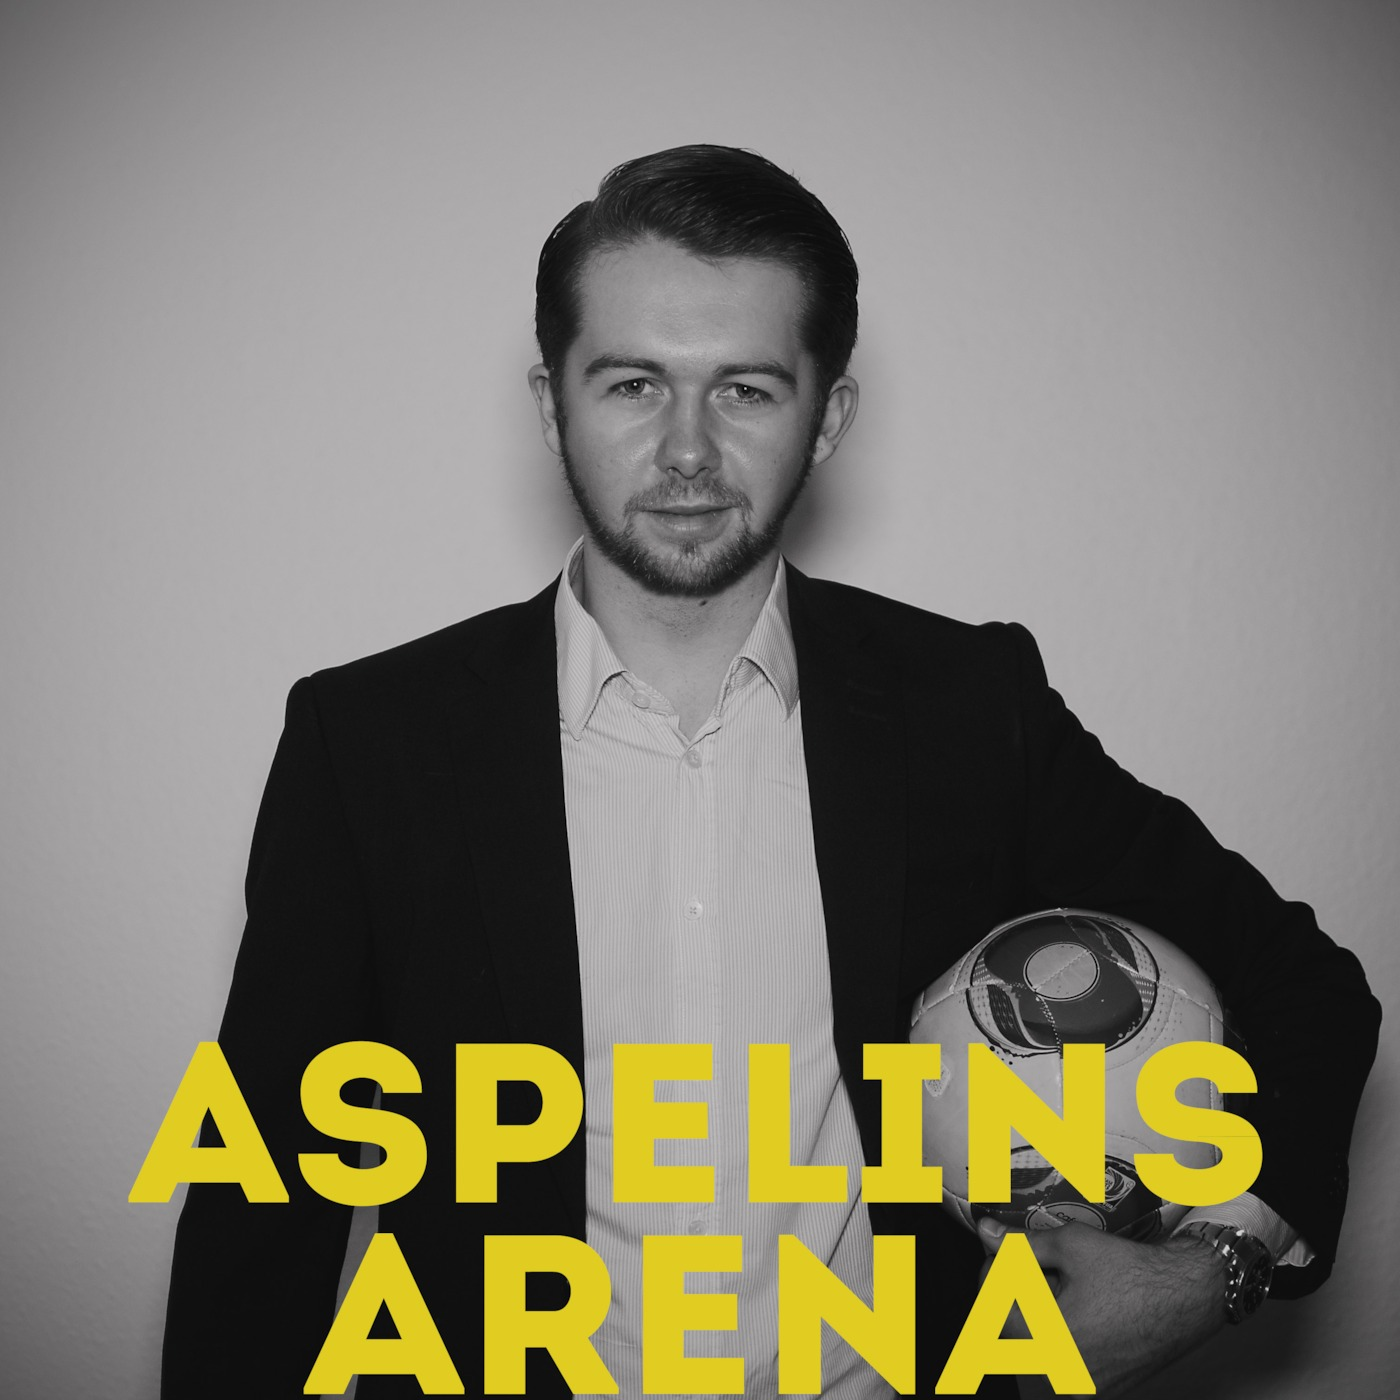 Aspelins Arena